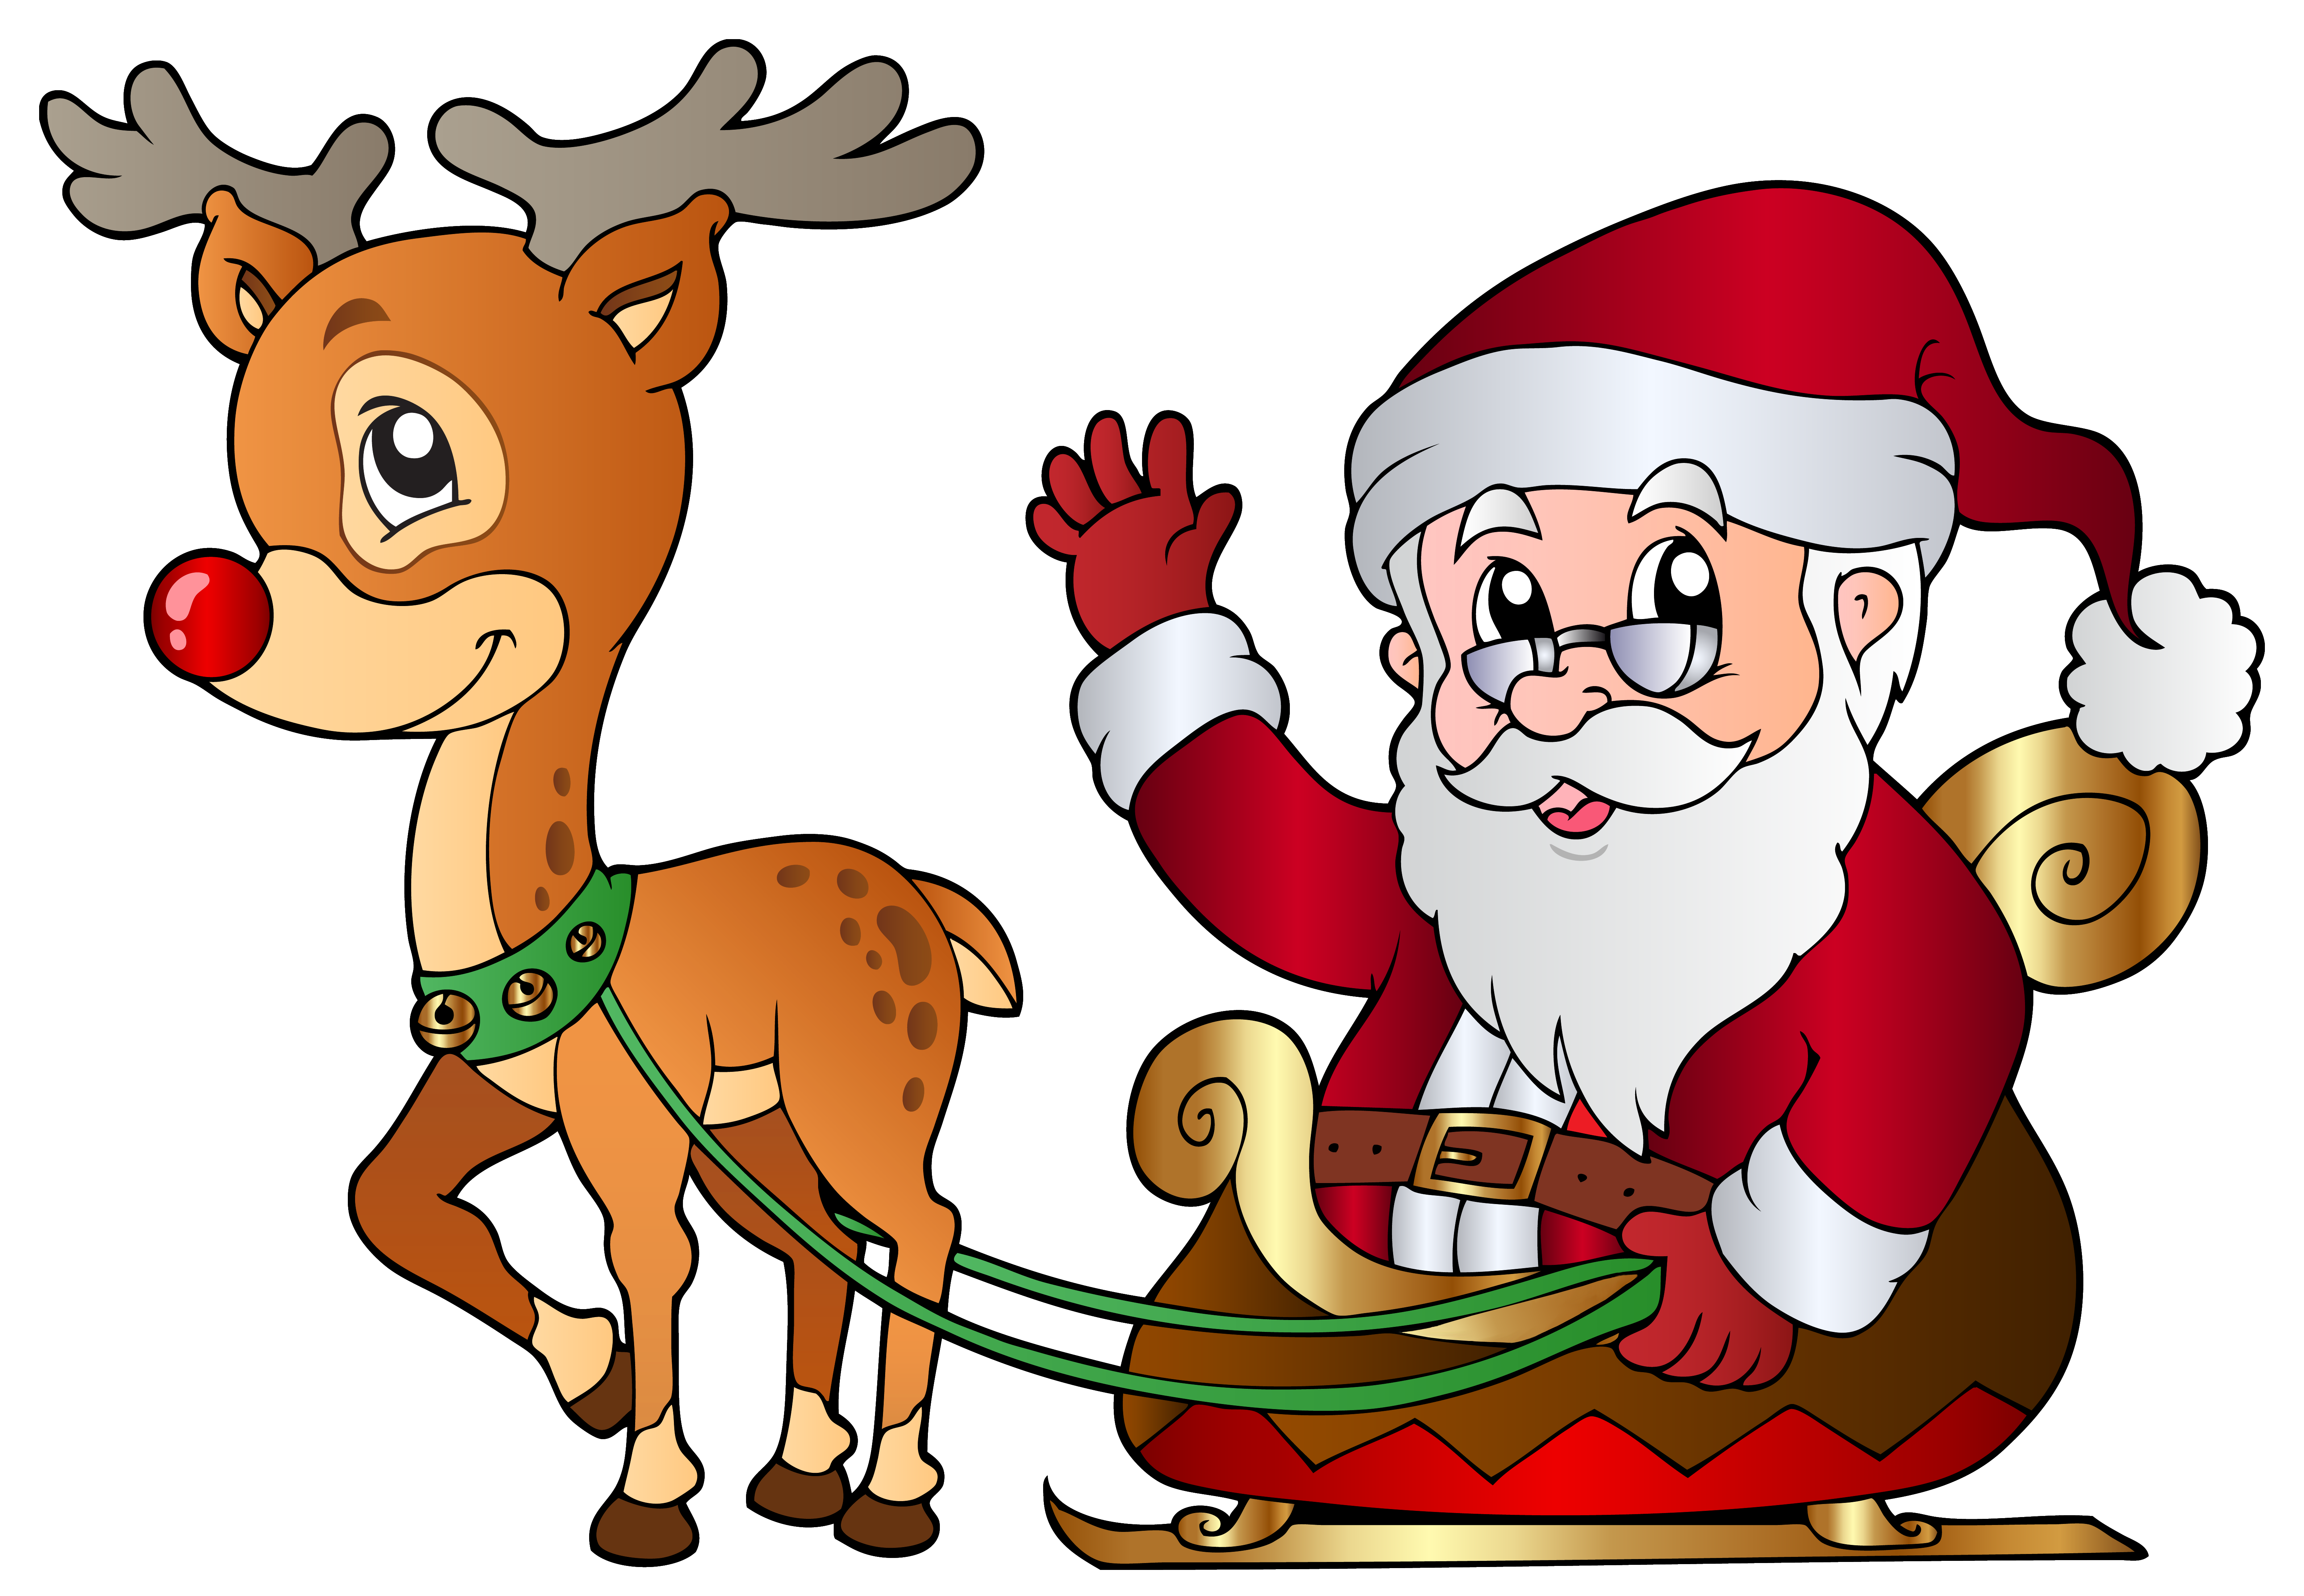 And rudolph png image. Santa clipart